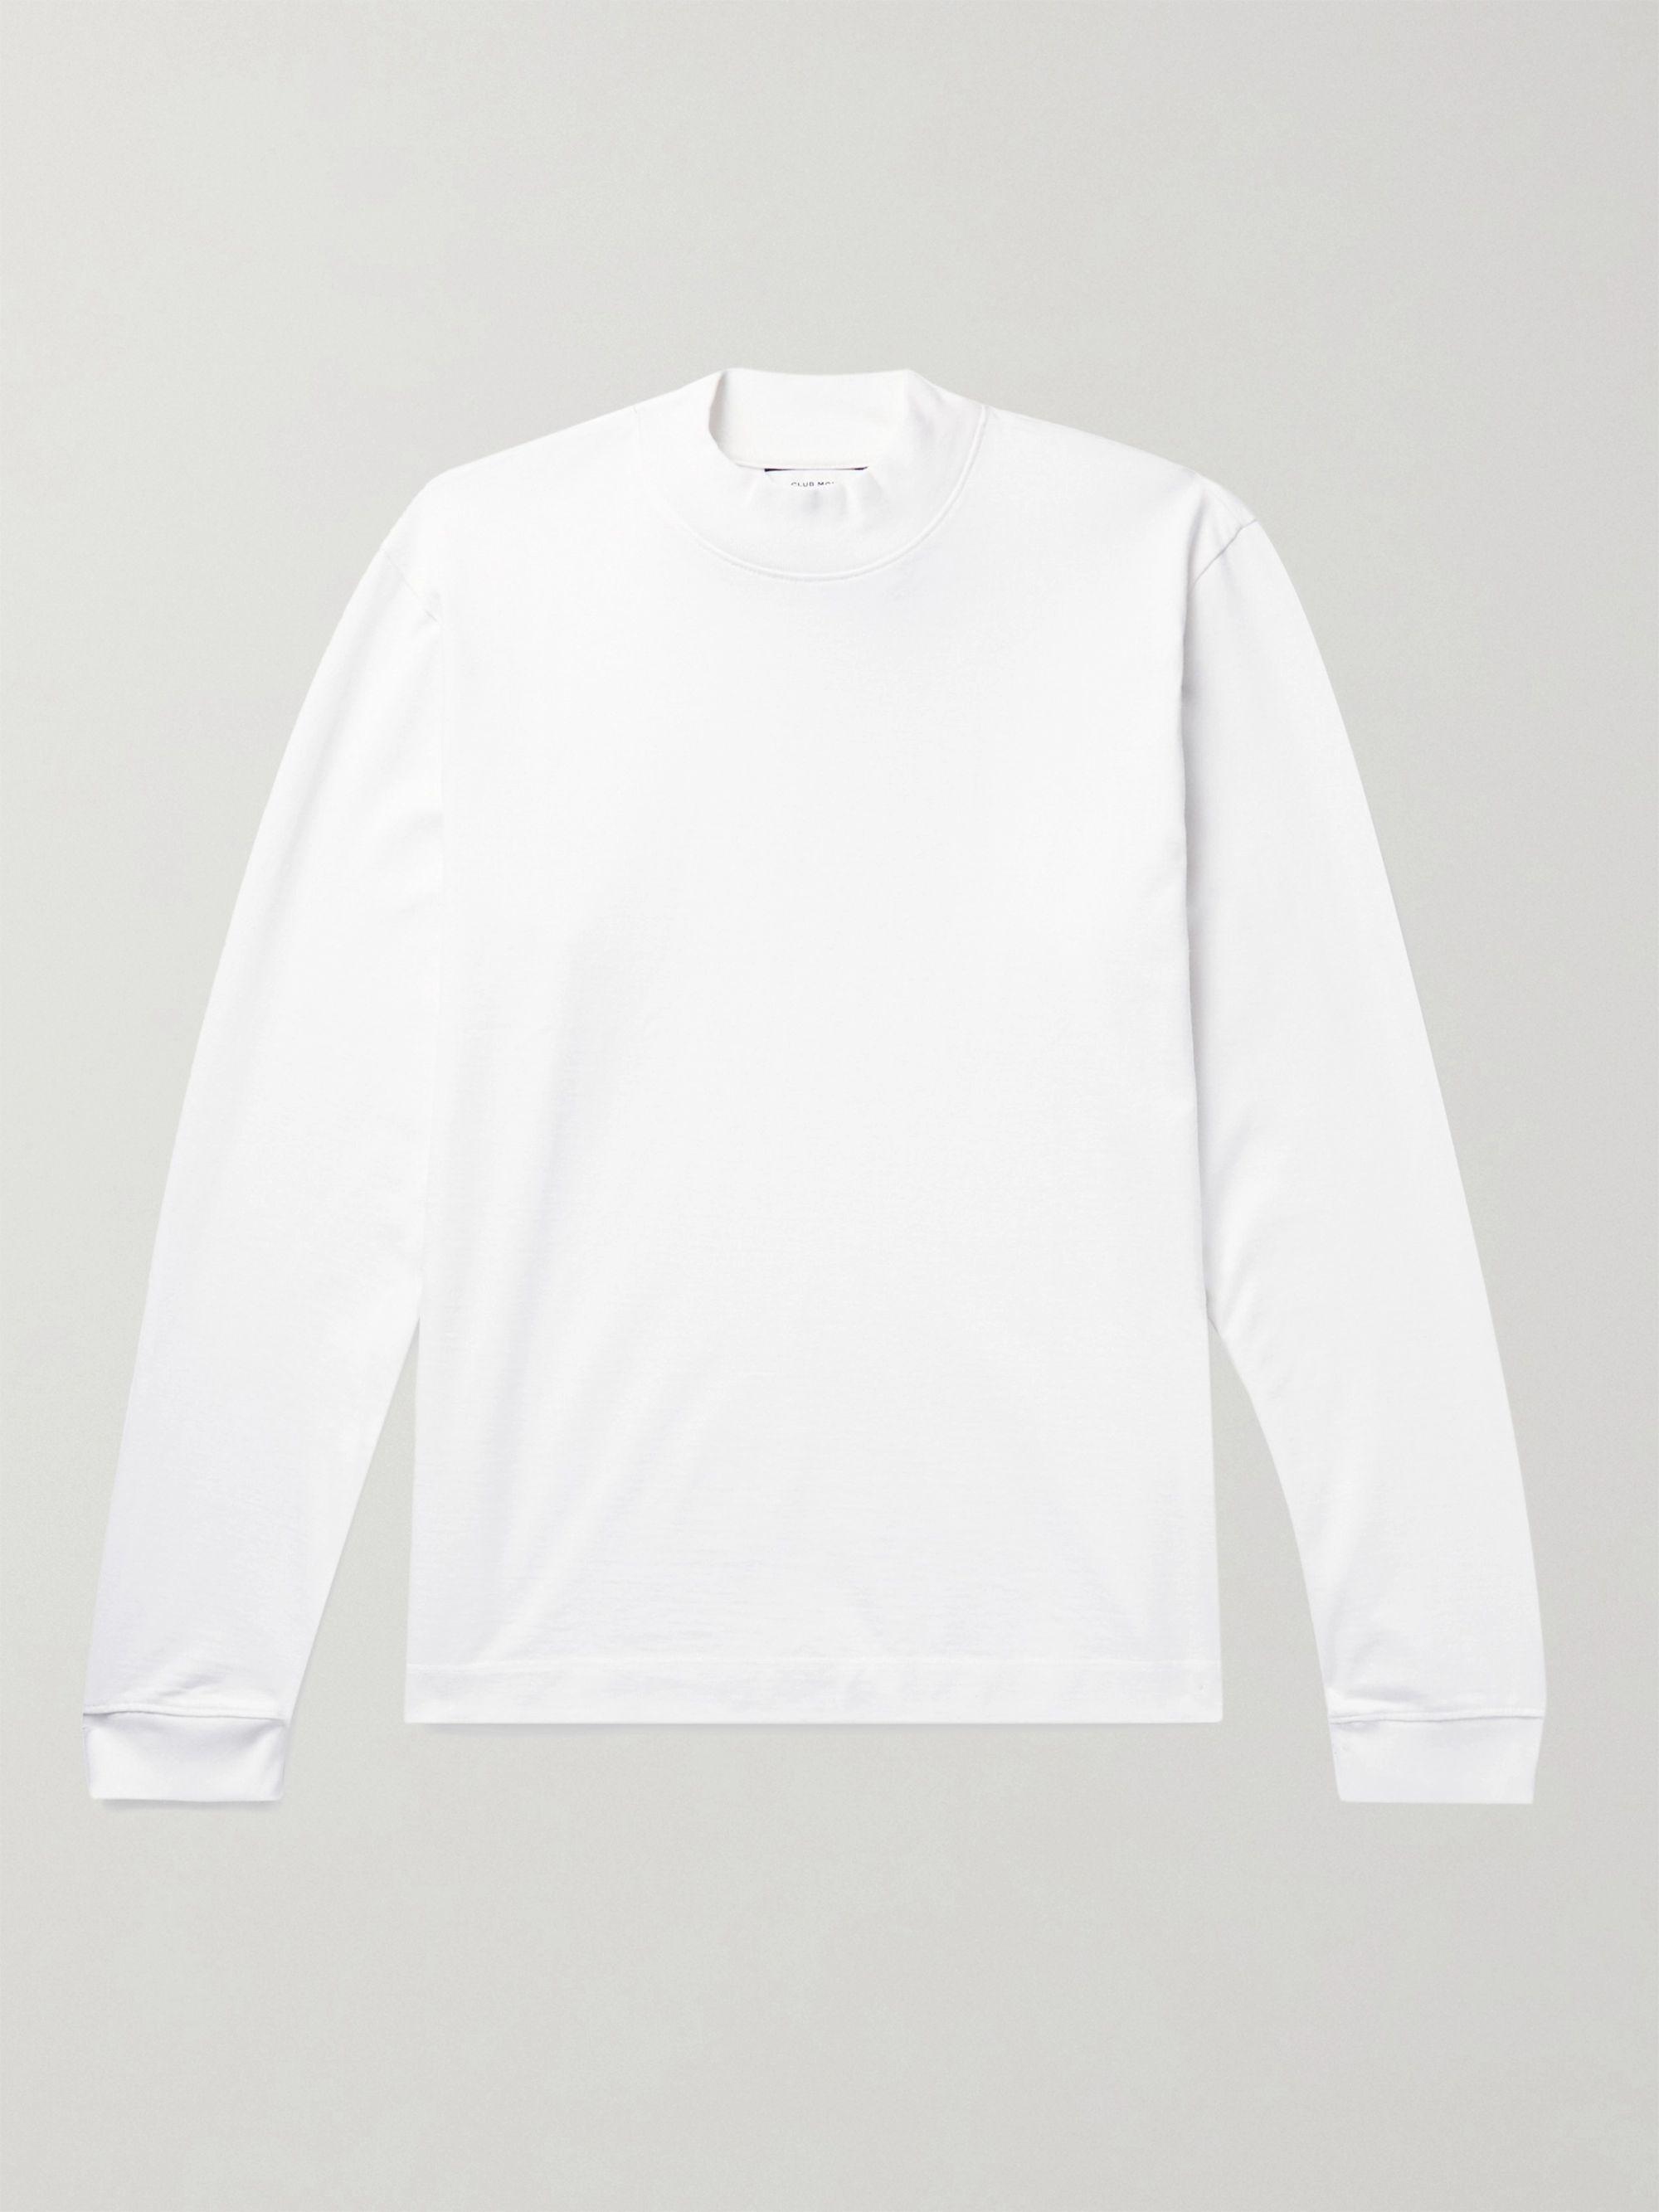 CLUB MONACO Cotton-Jersey Mock-Neck T-Shirt